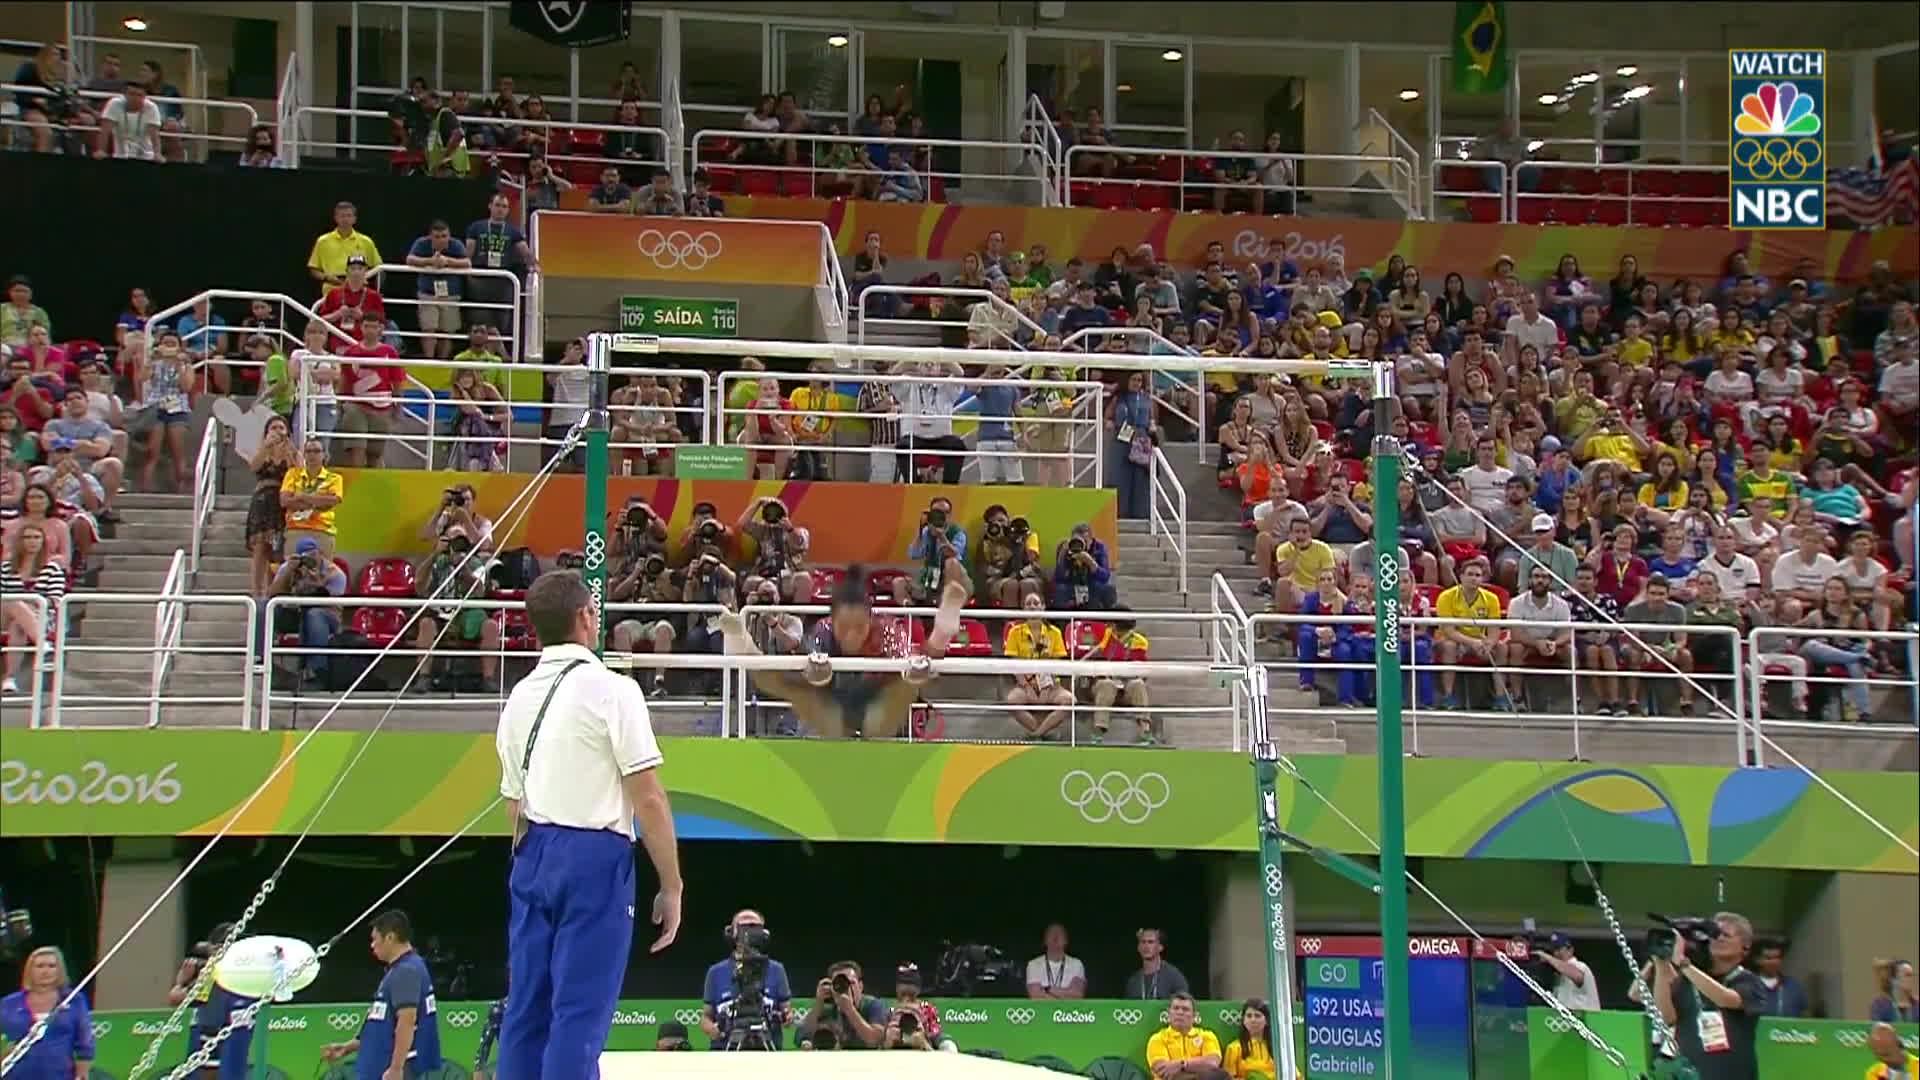 nbc sports, olymgifs, olympics, Gabby Douglas nearly flawless on uneven bar routine GIFs